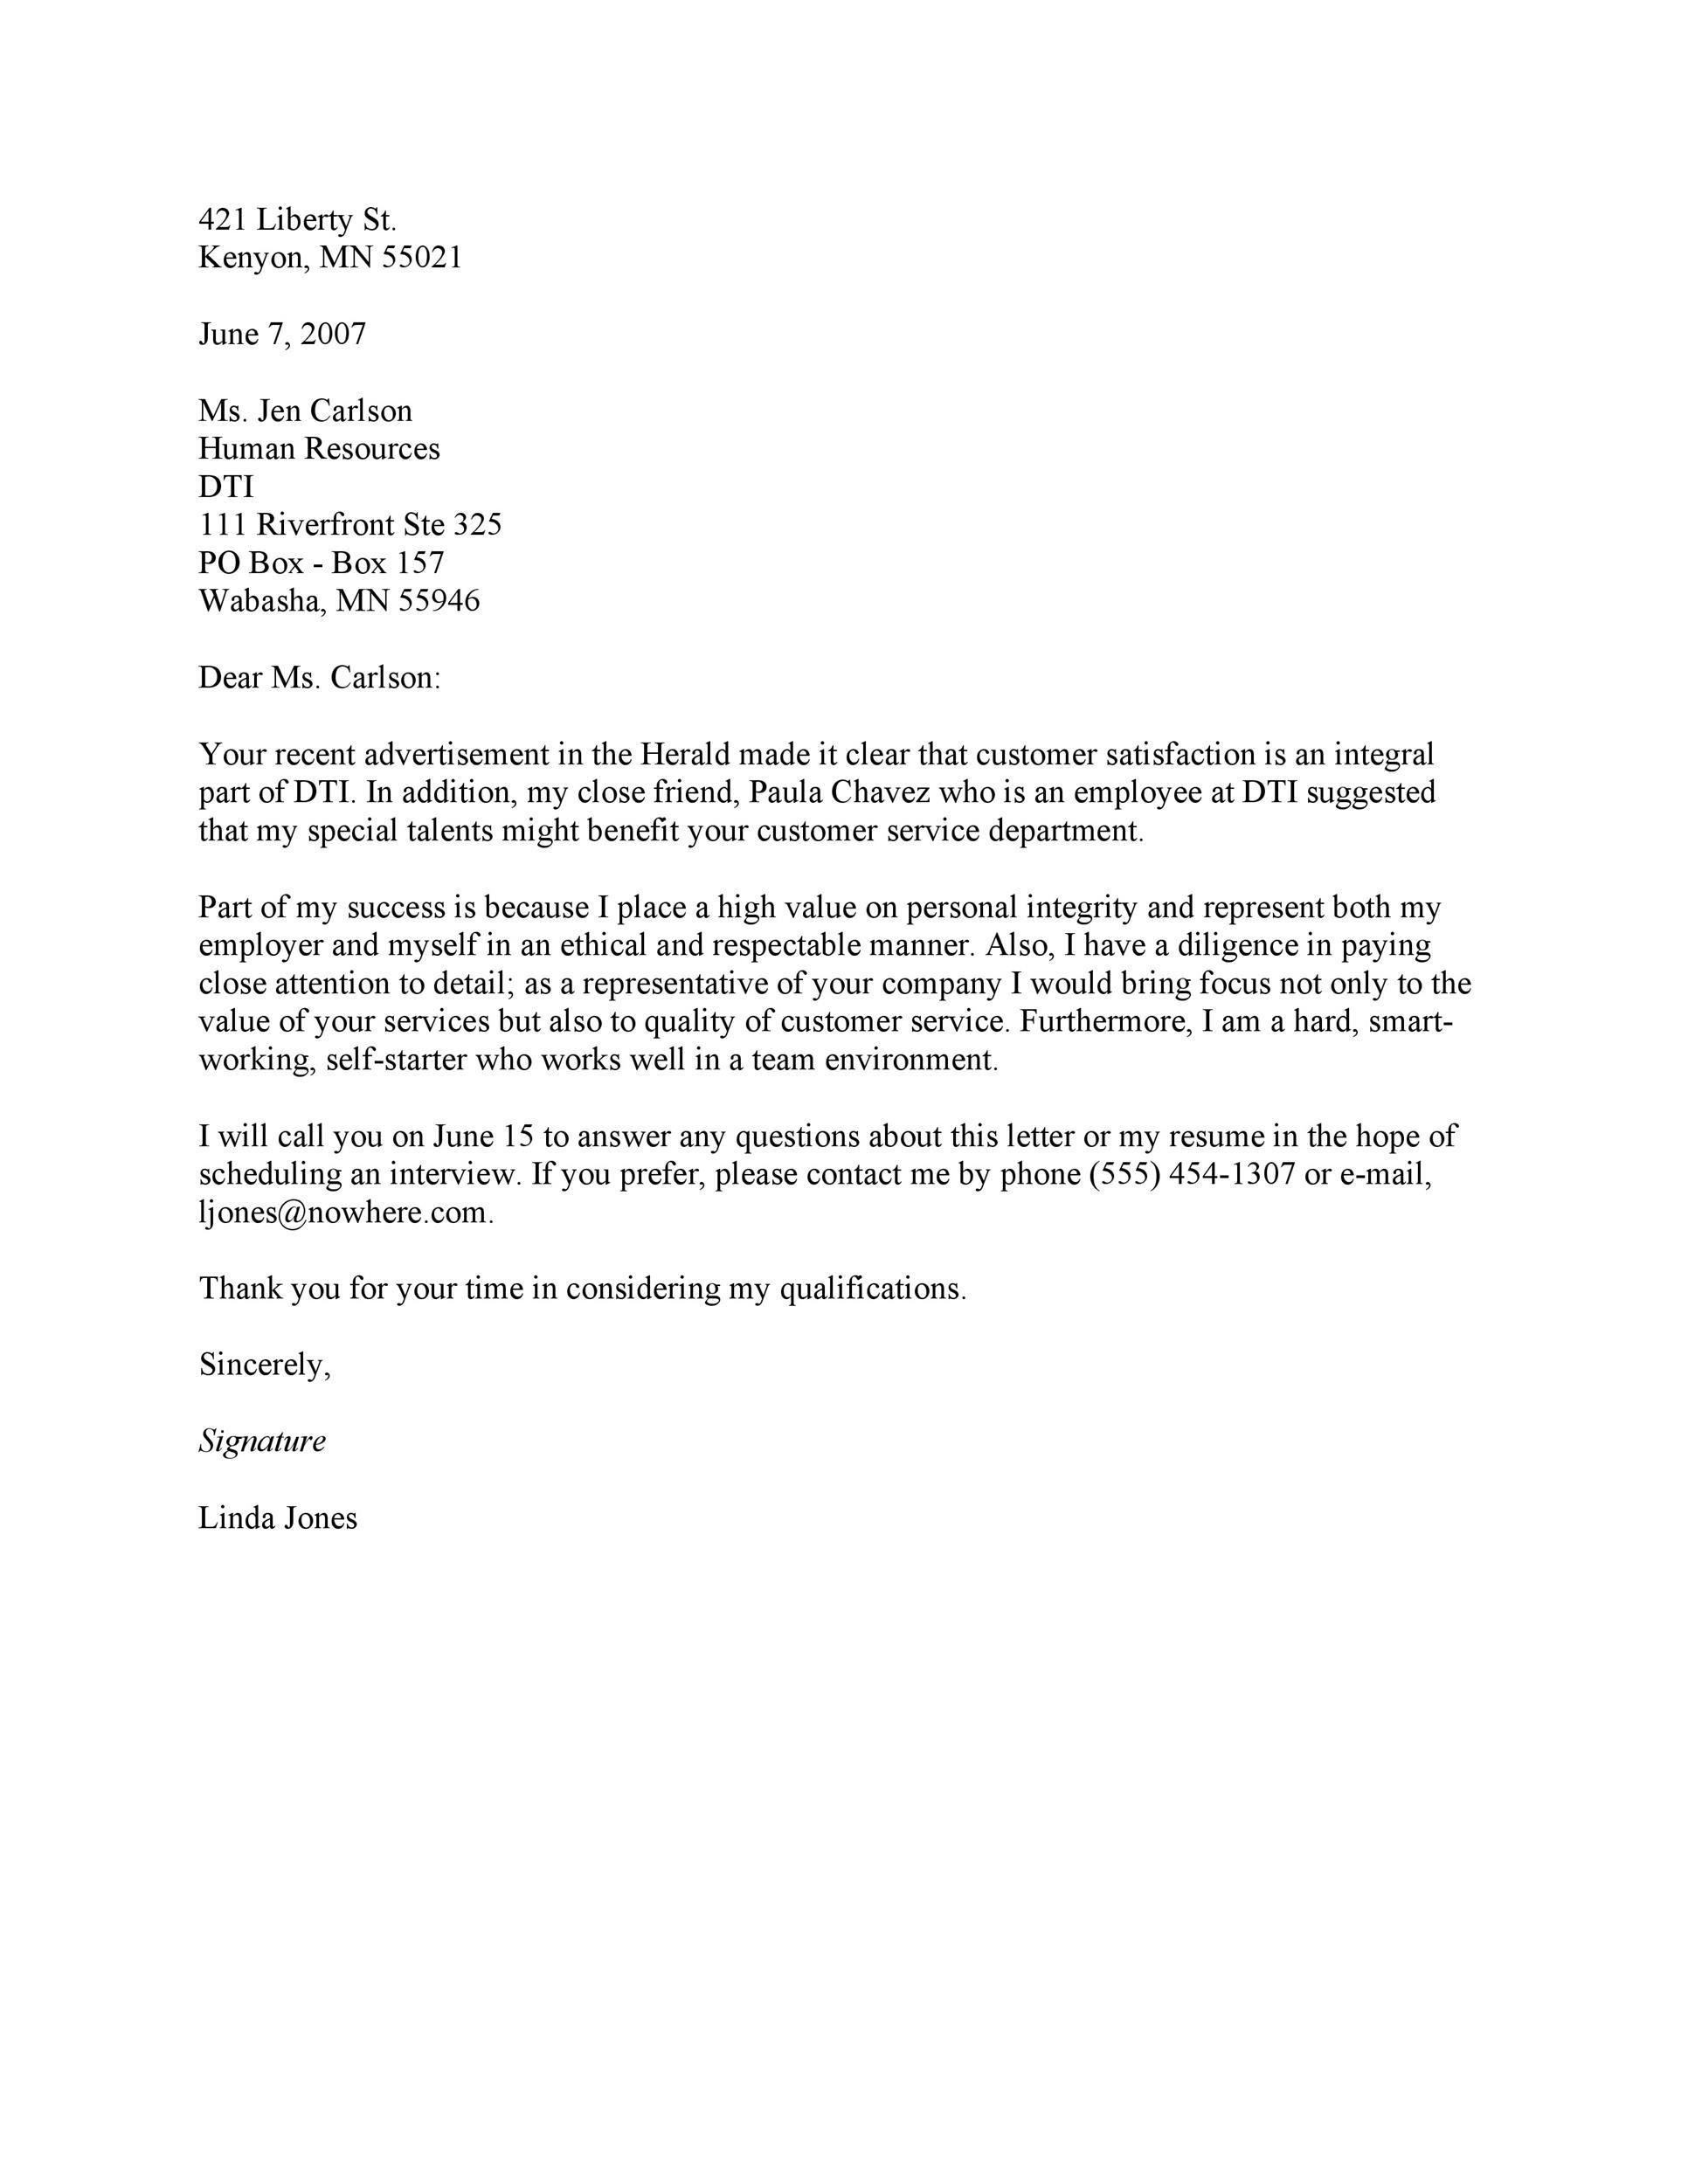 Free letter of interest 07